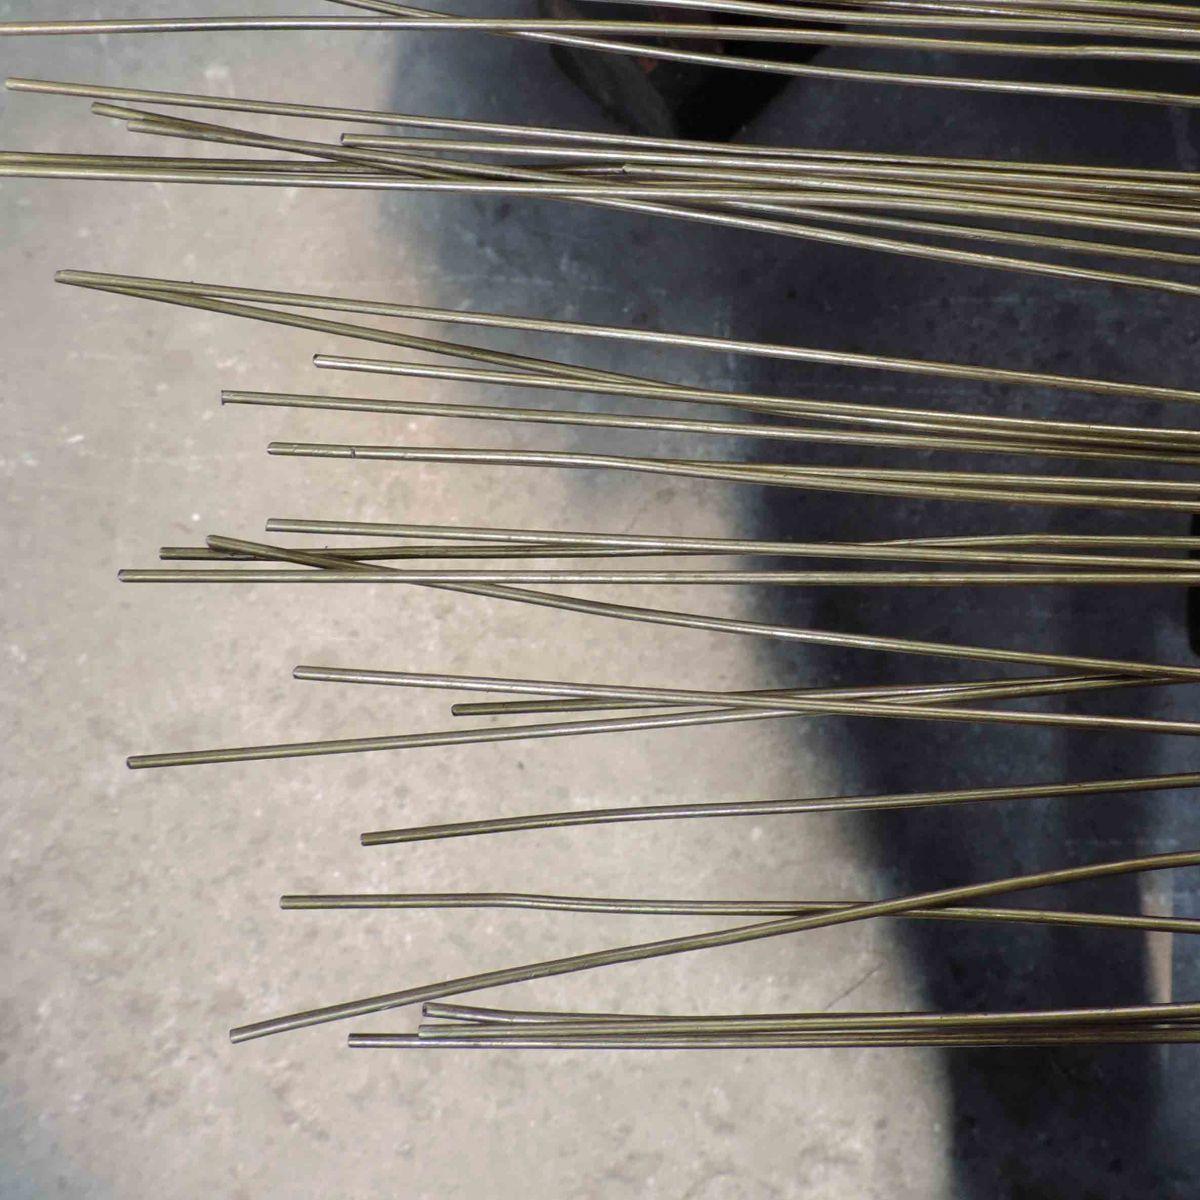 Barra Redonda (tubo) De Latão 2,2mm X 3m - Q17